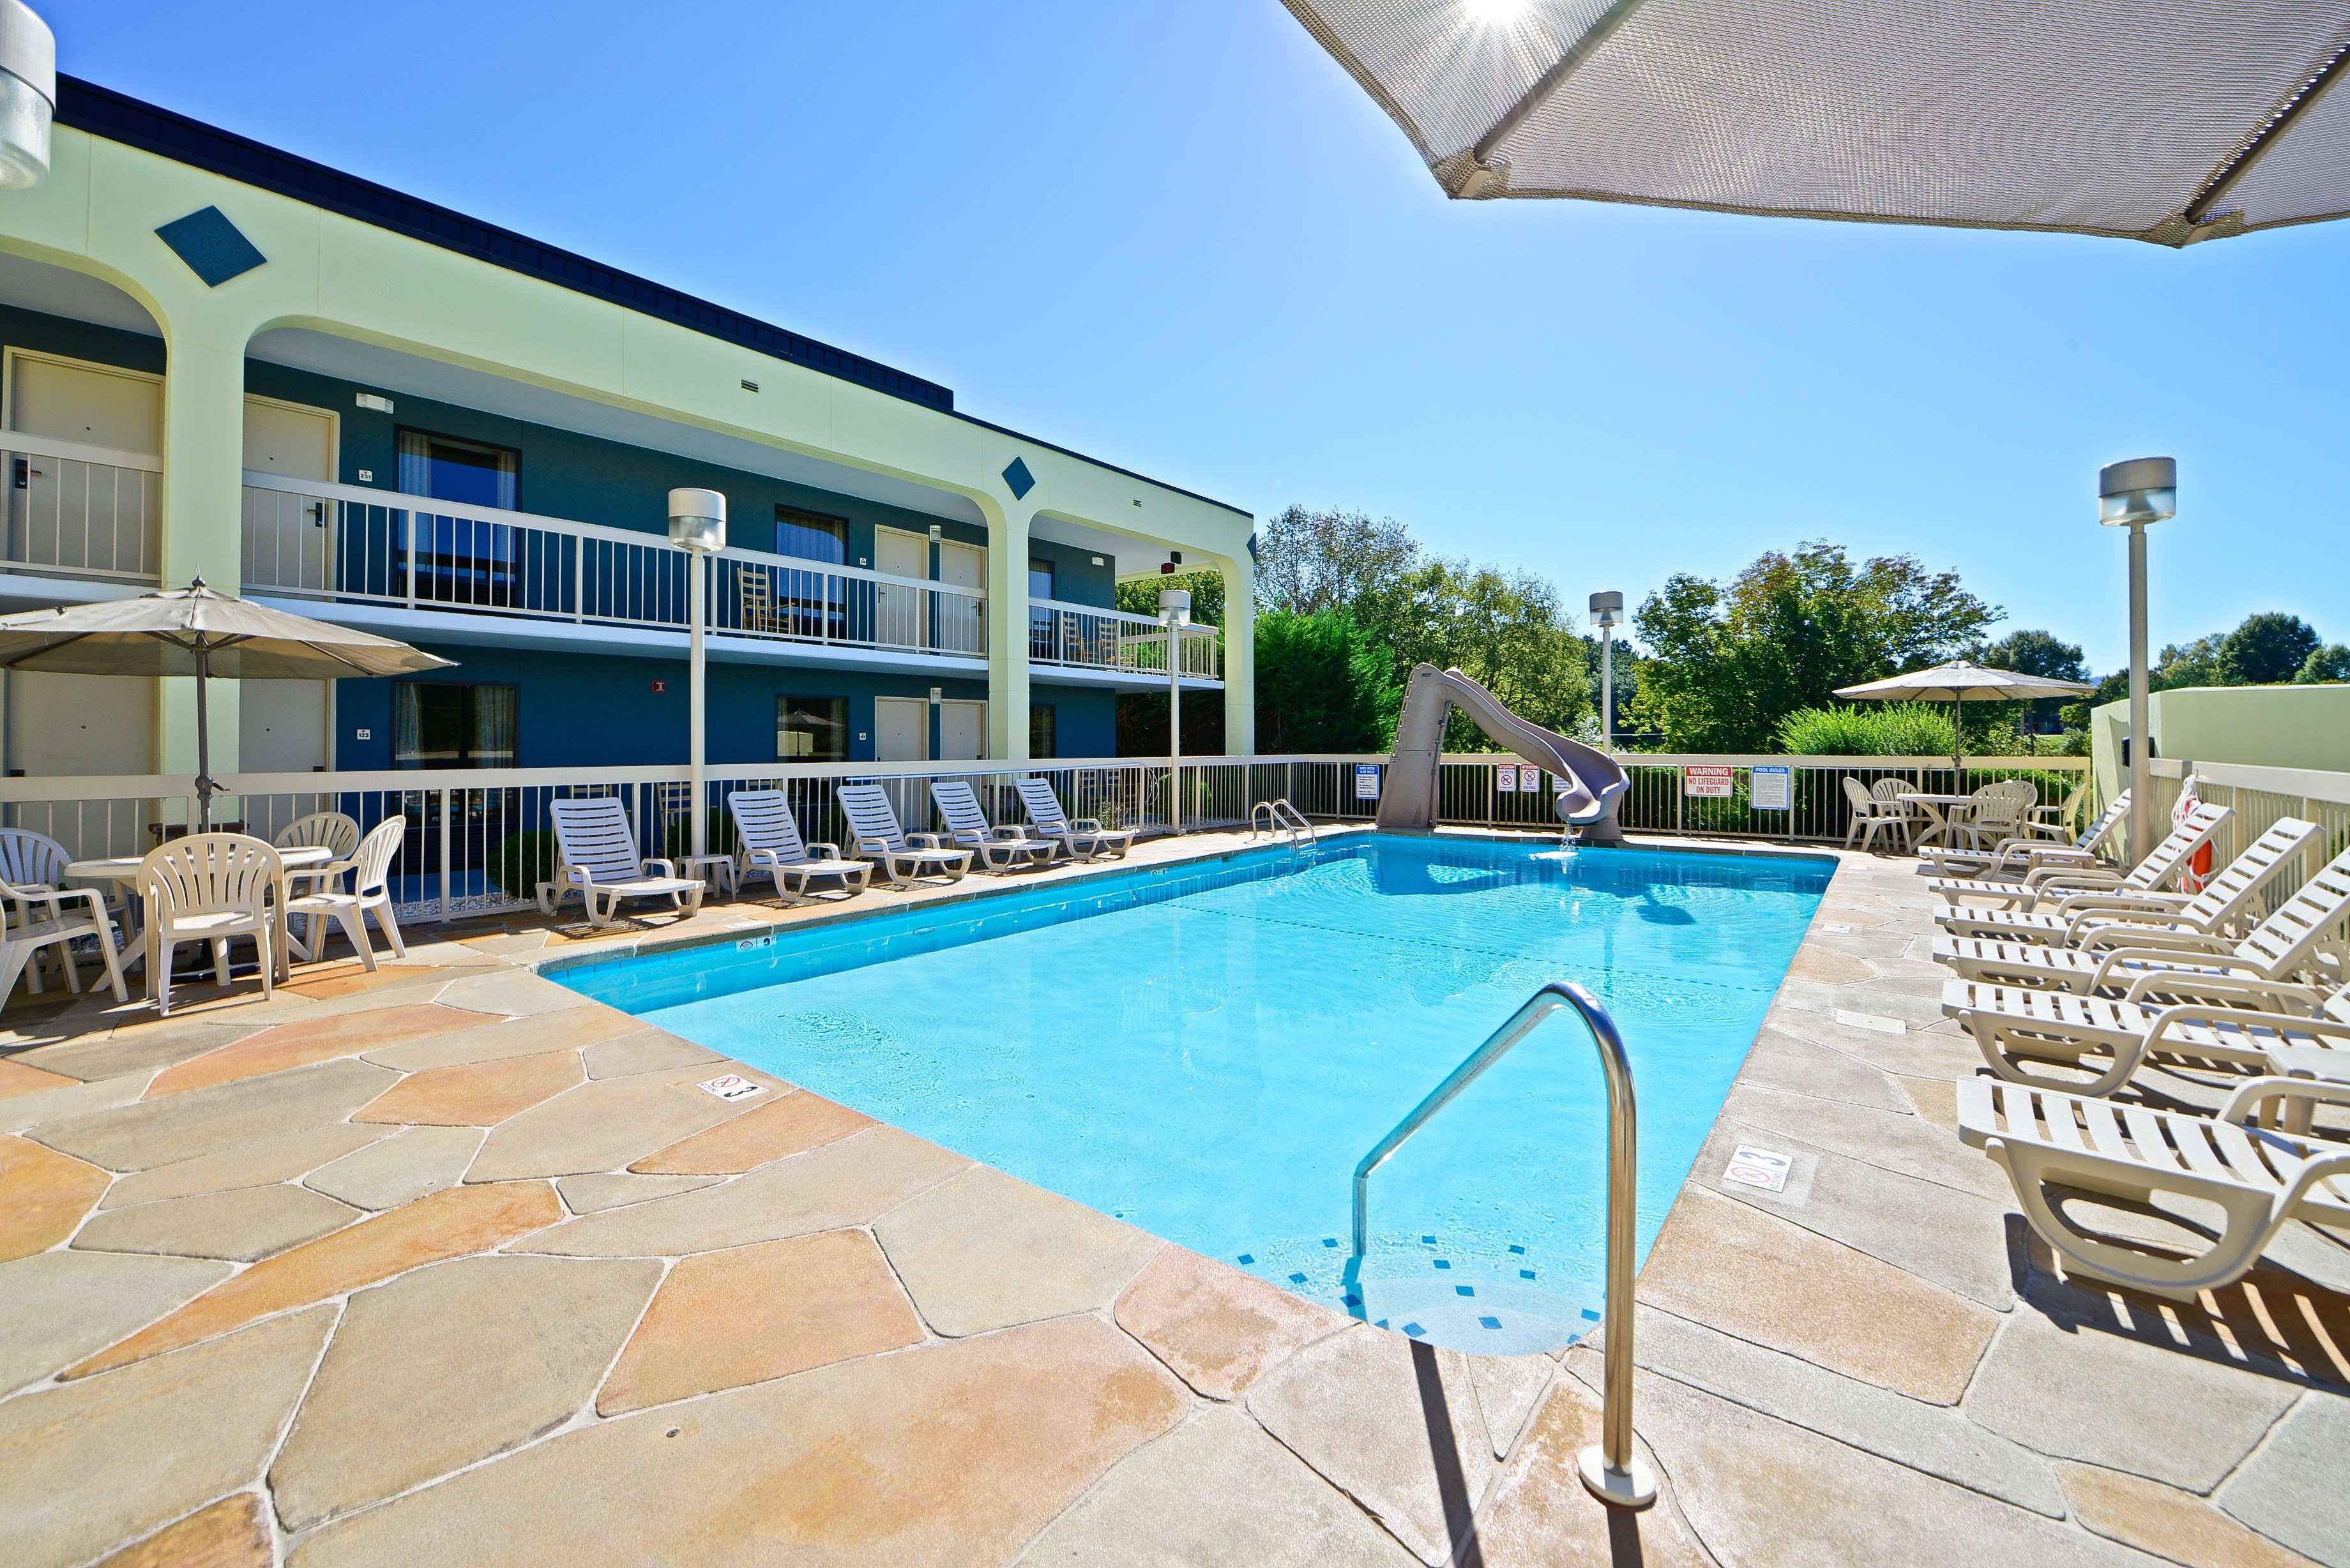 Best Western Cades Cove Inn image 13